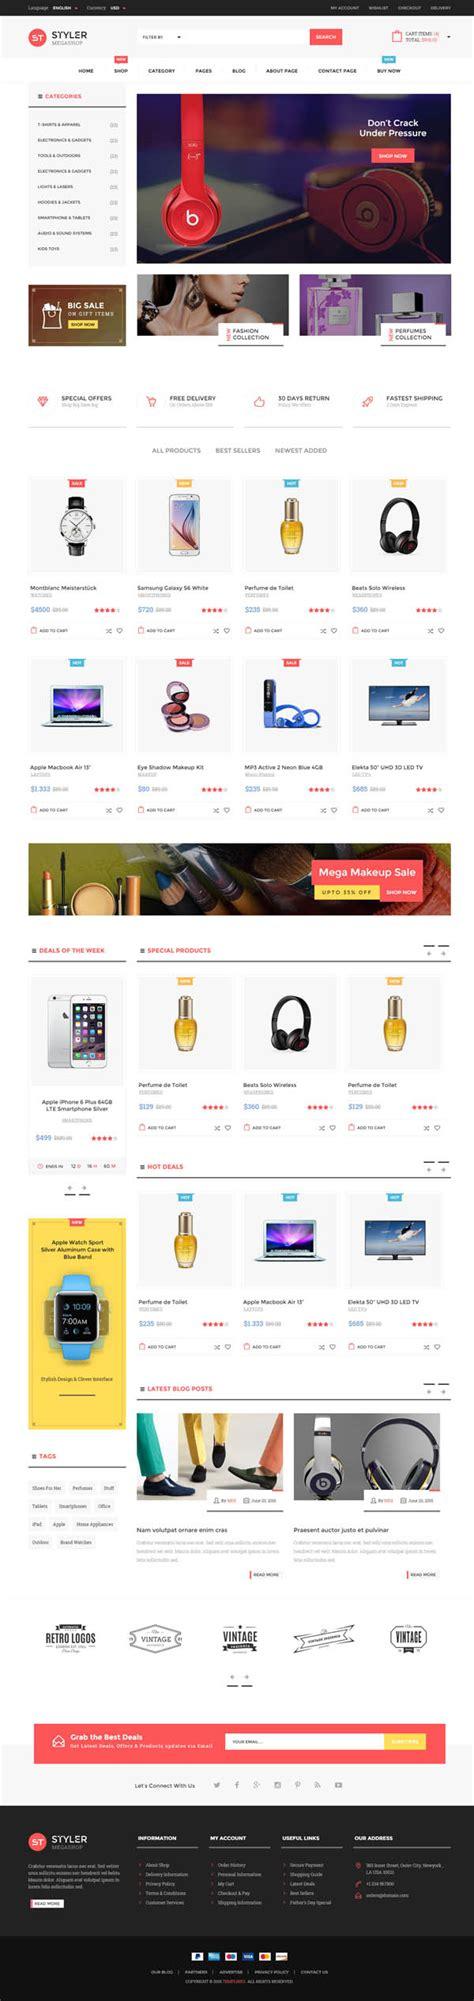 12 Best Responsive Html5 Templates For Designer Html5 Css3 Design Blog Mega Shop Template